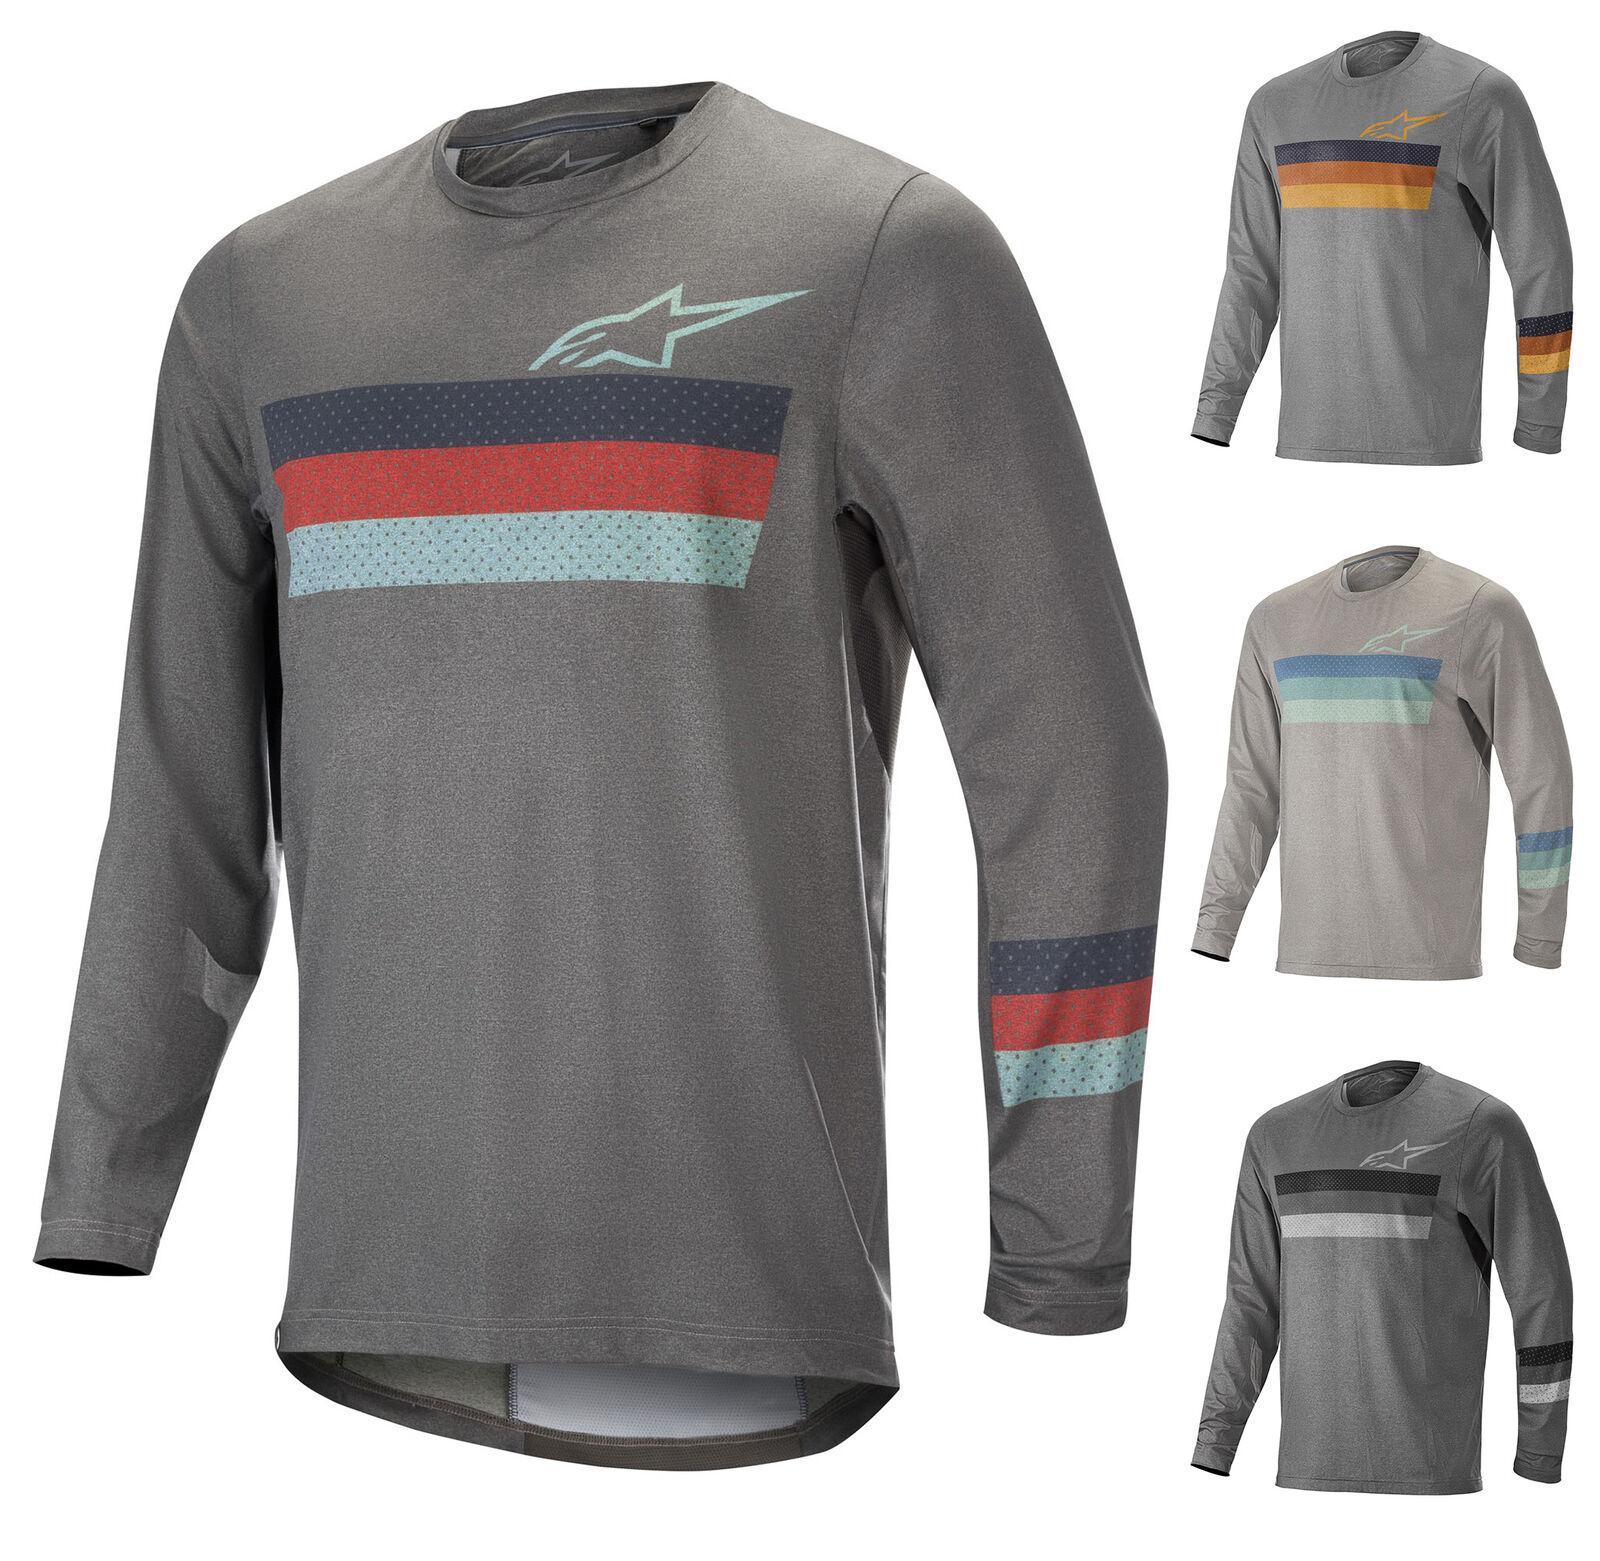 1763819 Alpinestars ALPS 6.0 LS JERSEY Mens  T-Shirt MTB Mountain Biking Trail  online shopping and fashion store